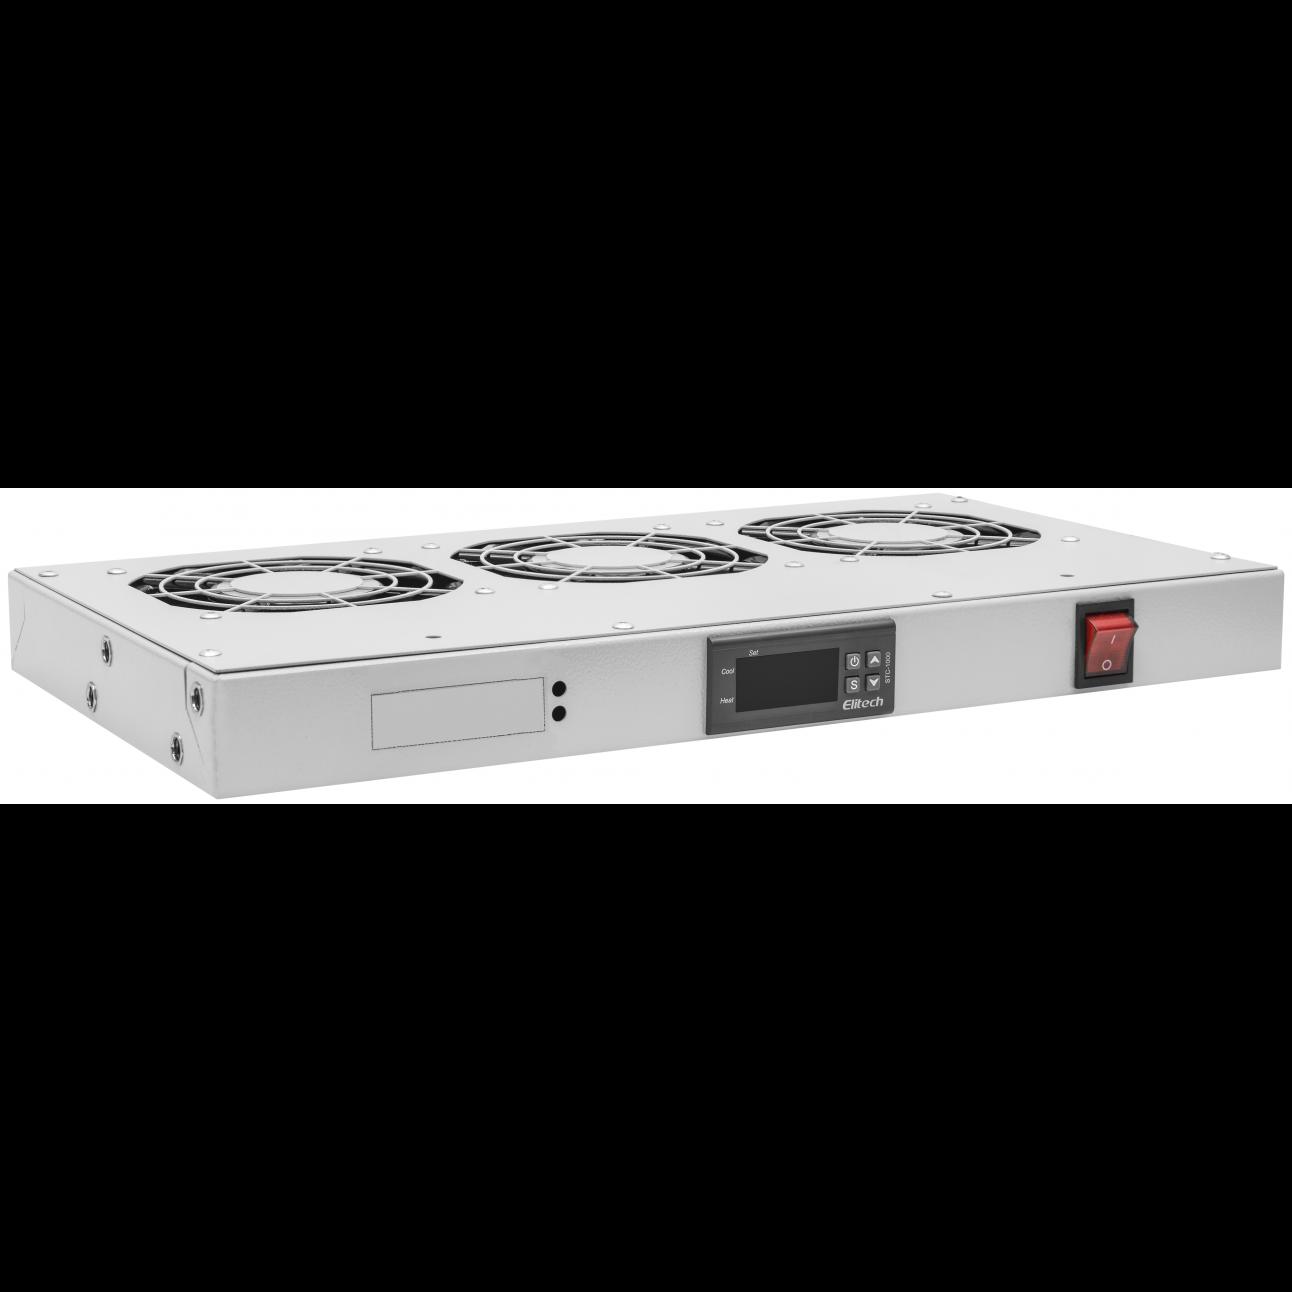 "Модуль вентиляторный 19"", 3 вентилятора, регулируемая глубина 230-415мм, с цифровым терморегулятором"